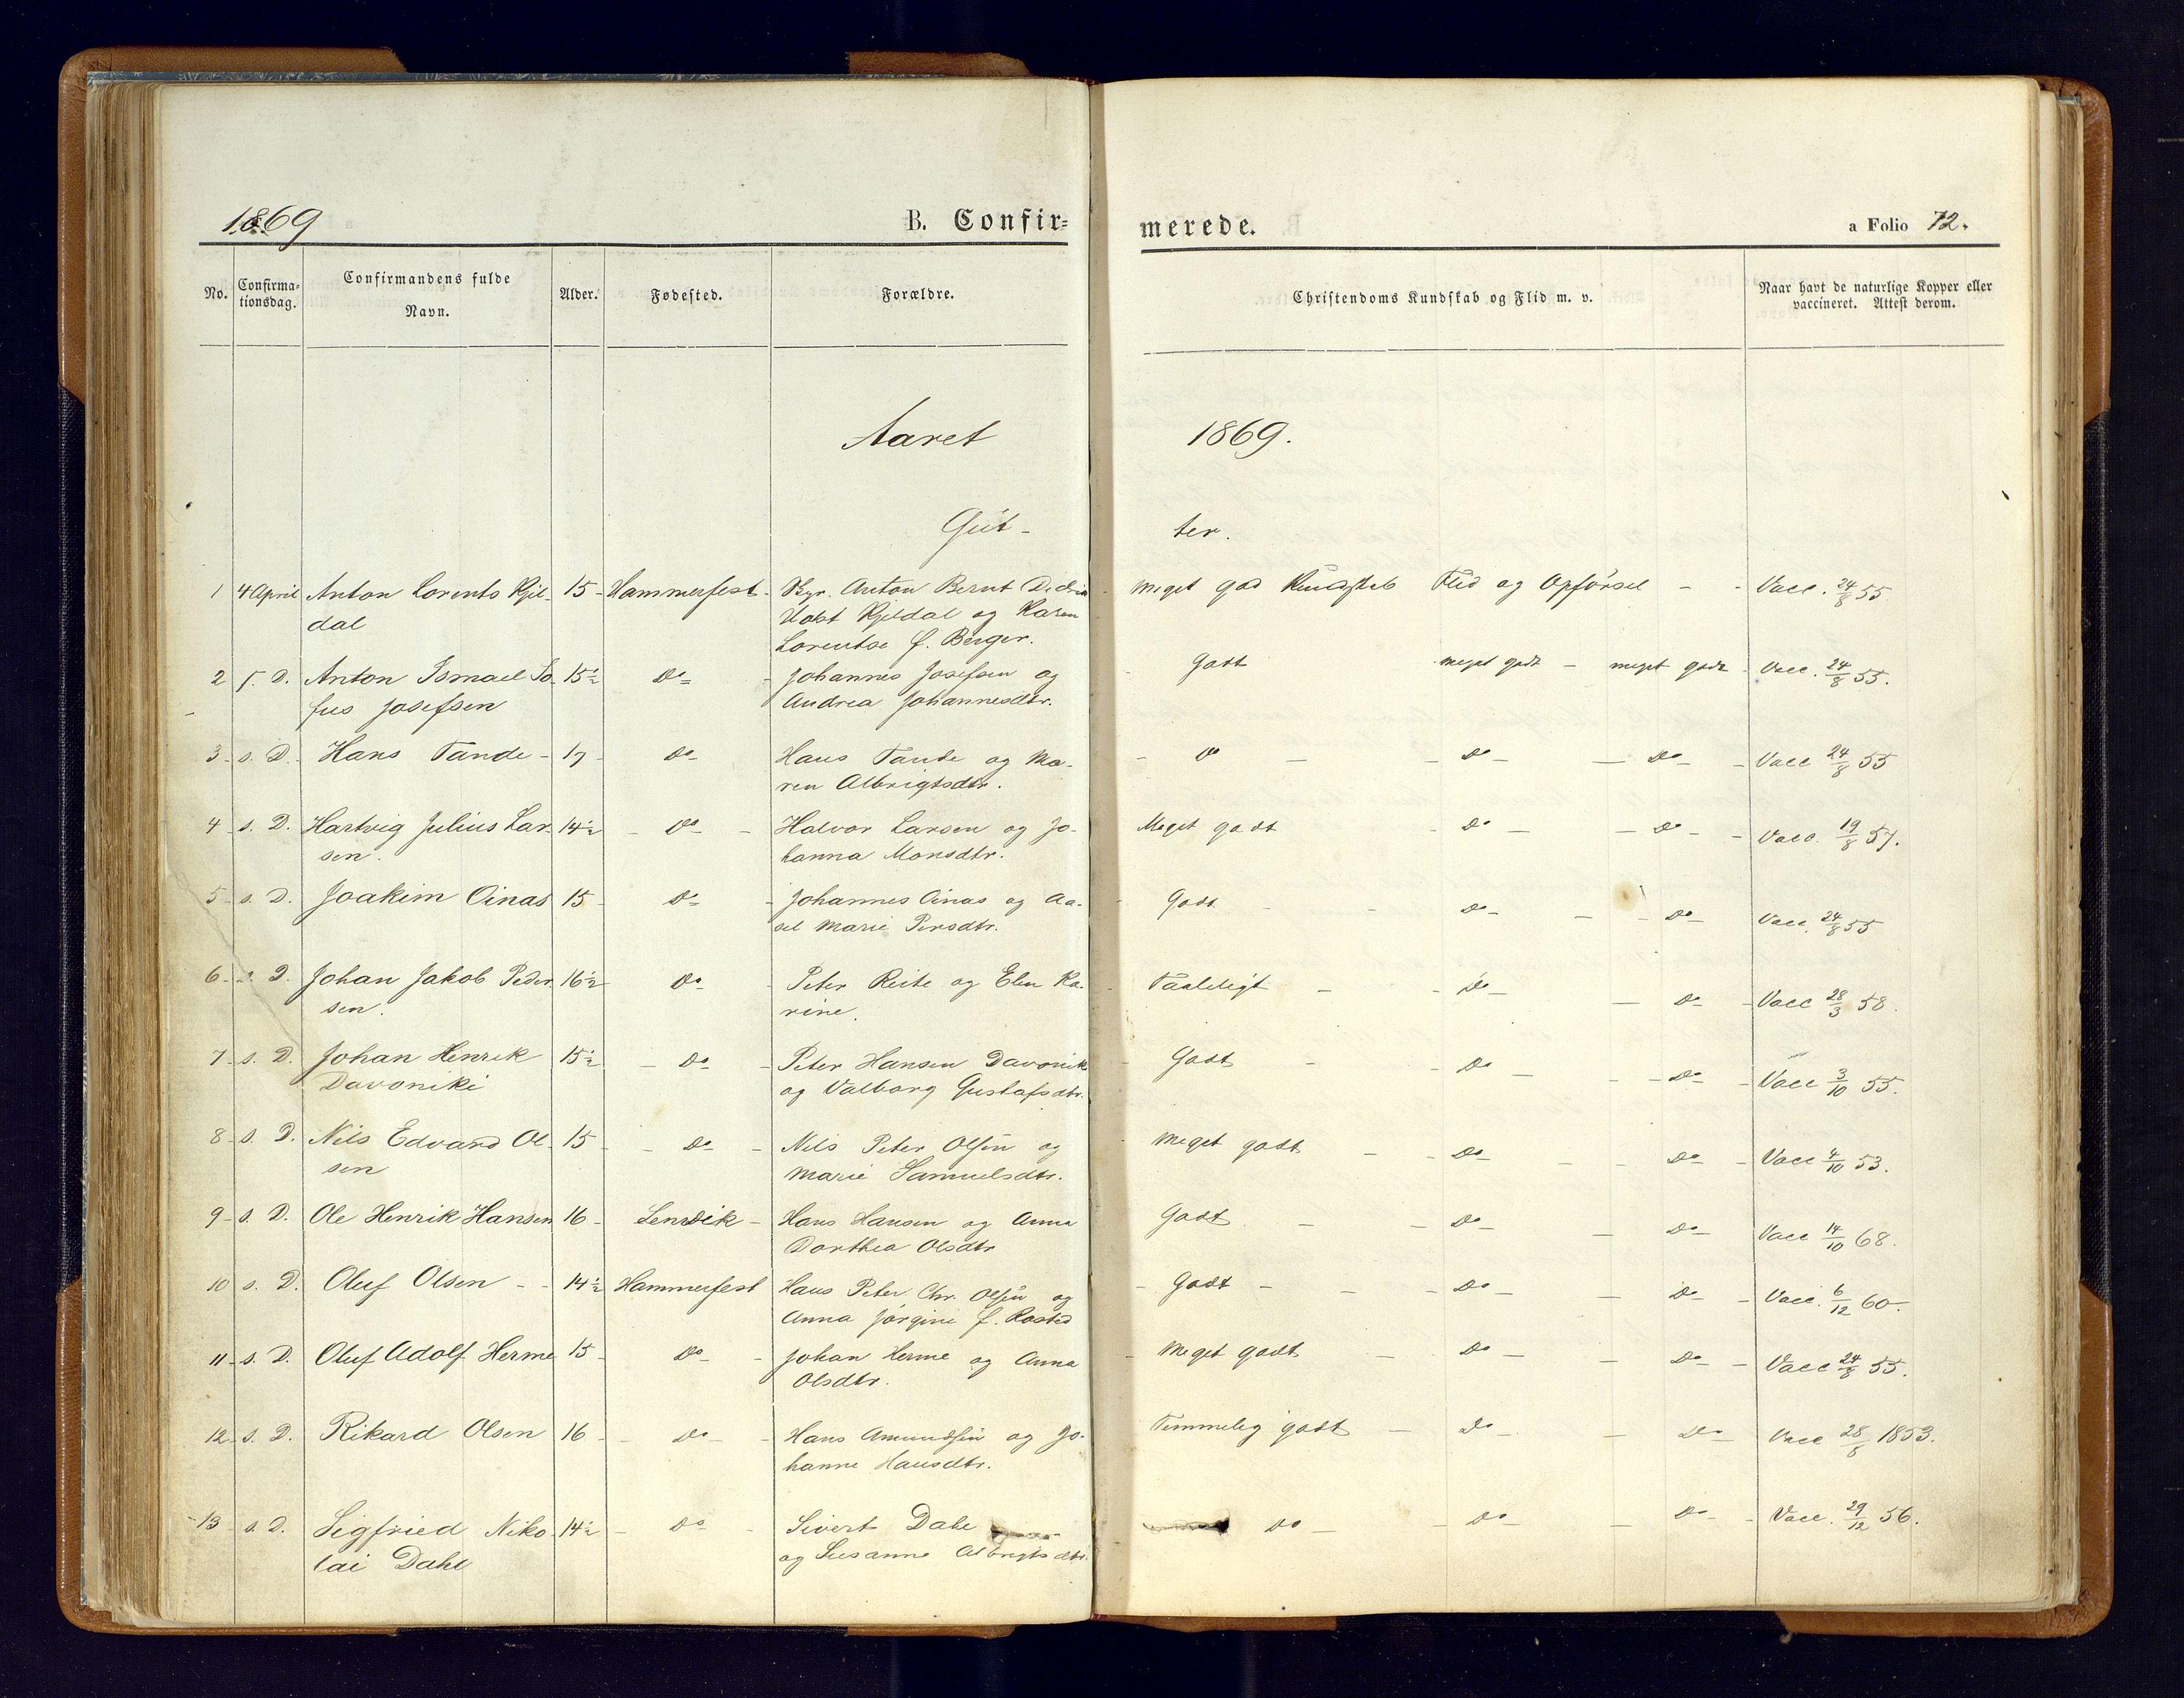 SATØ, Hammerfest sokneprestembete, Ministerialbok nr. 6, 1869-1877, s. 72